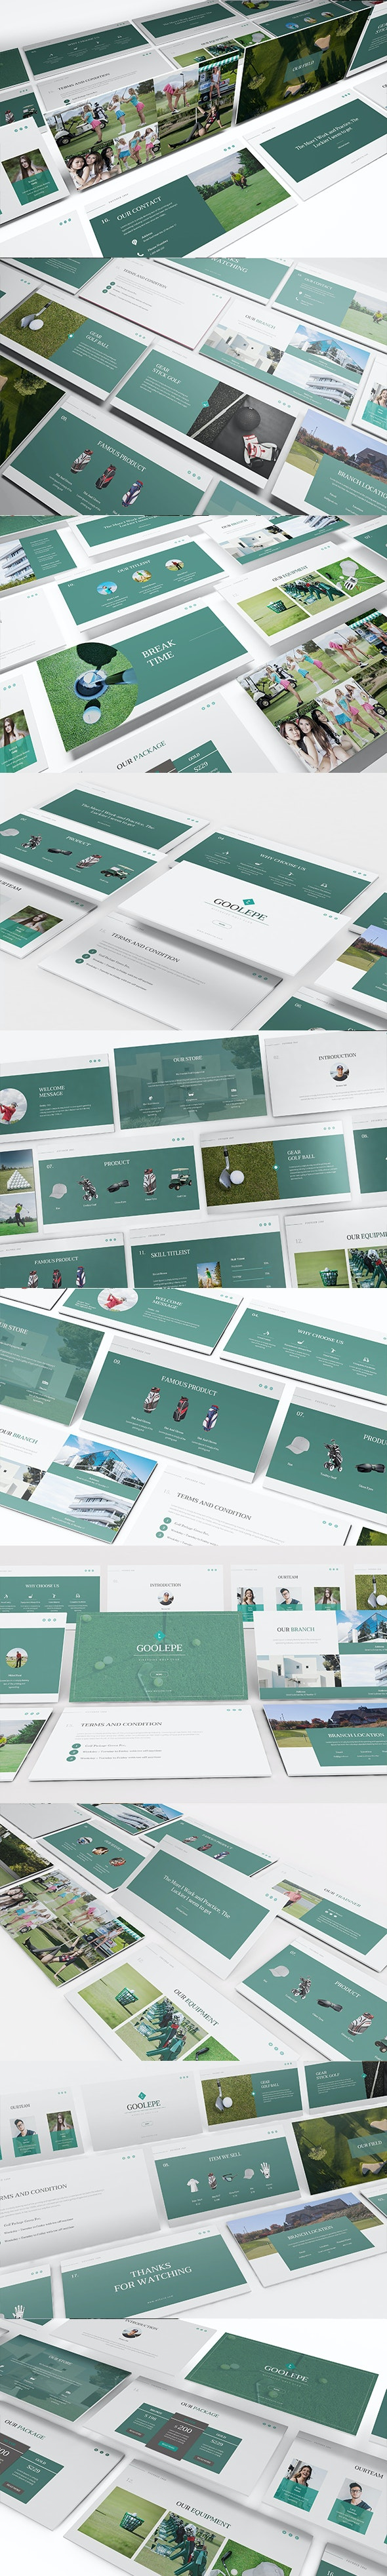 Golf Powerpoint Presentation Template - PowerPoint Templates Presentation Templates